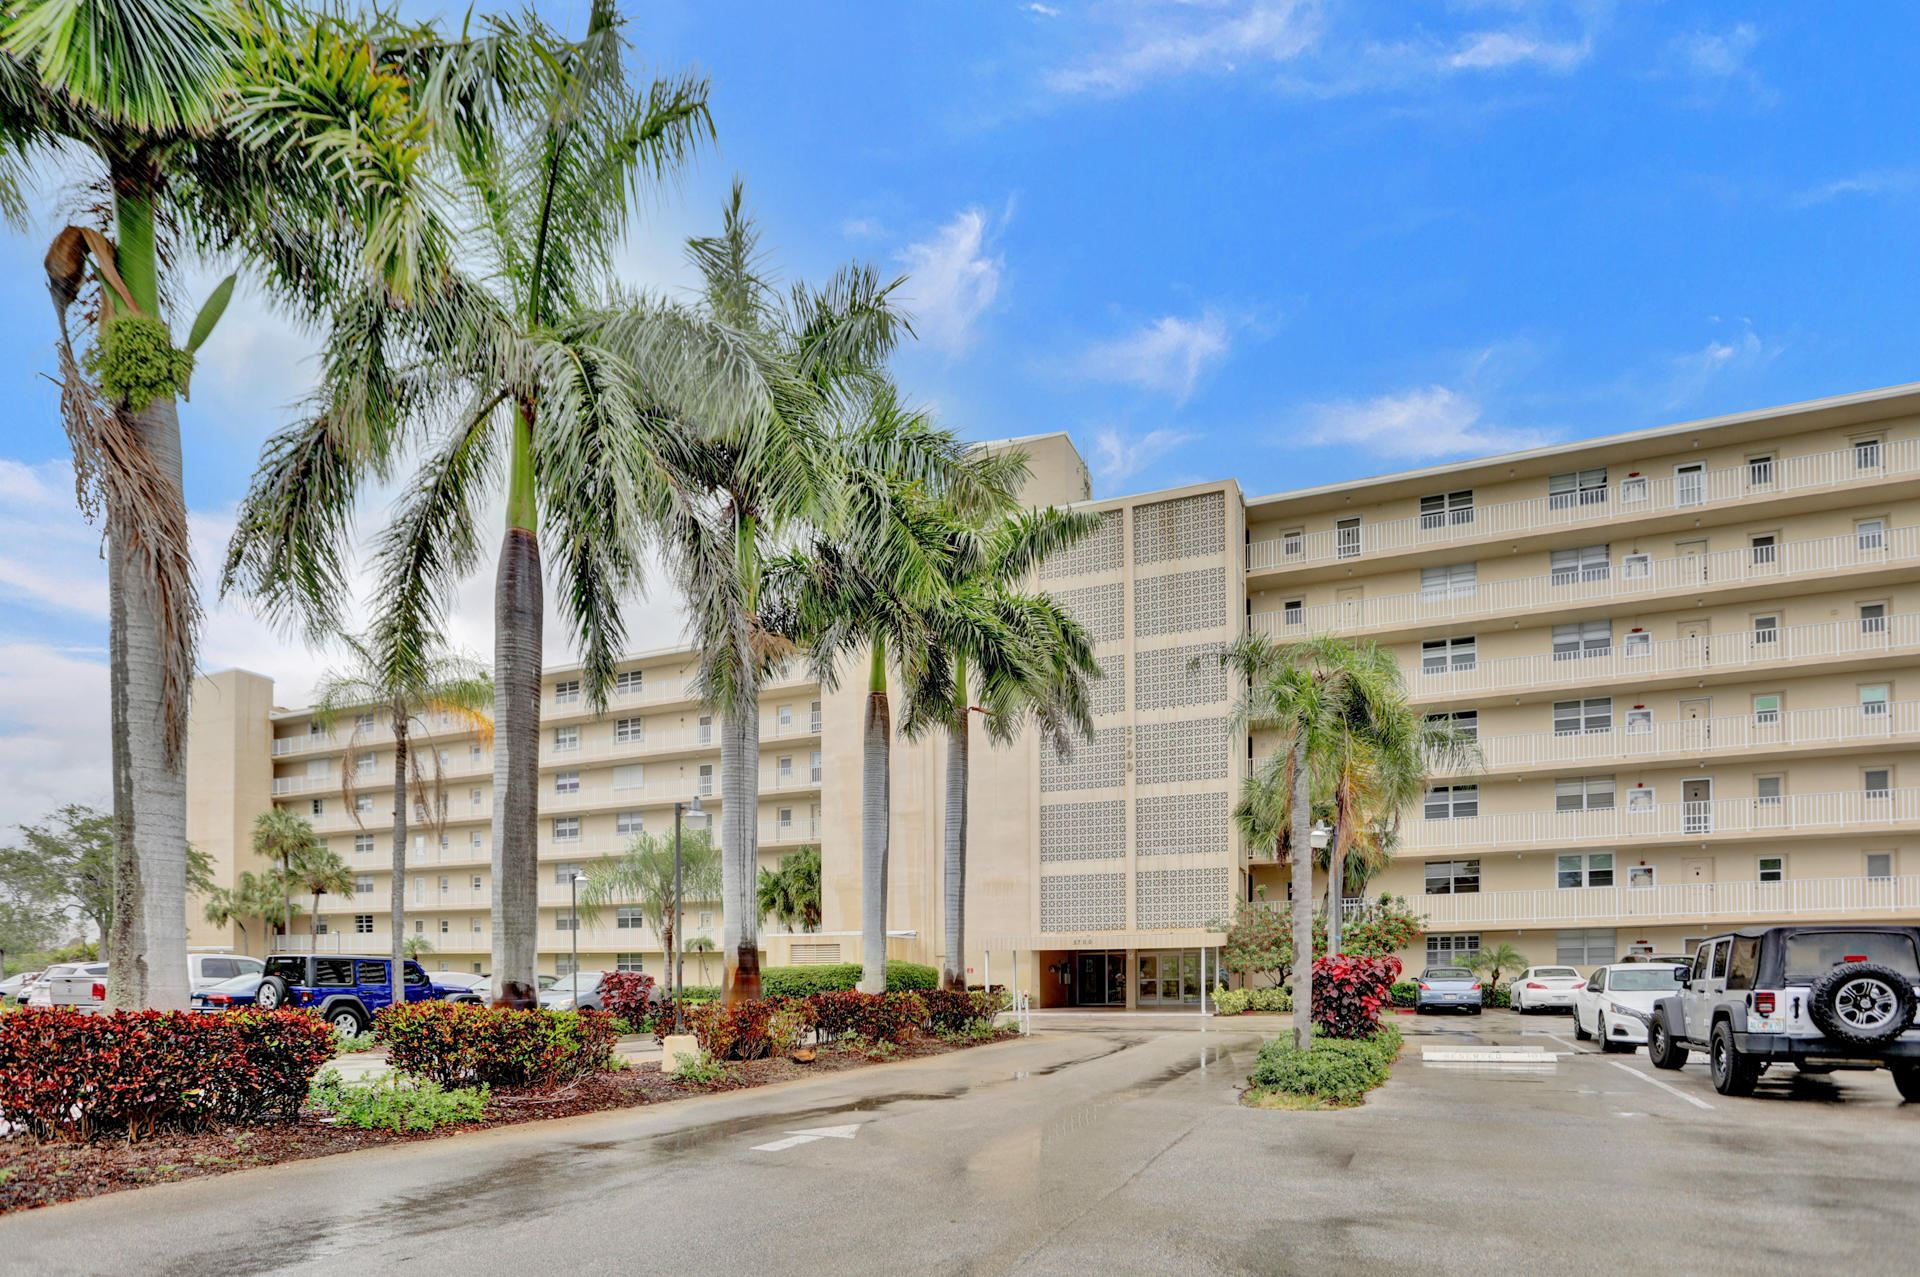 5700 NW 2nd Avenue #205, Boca Raton, FL 33487 - #: RX-10615273